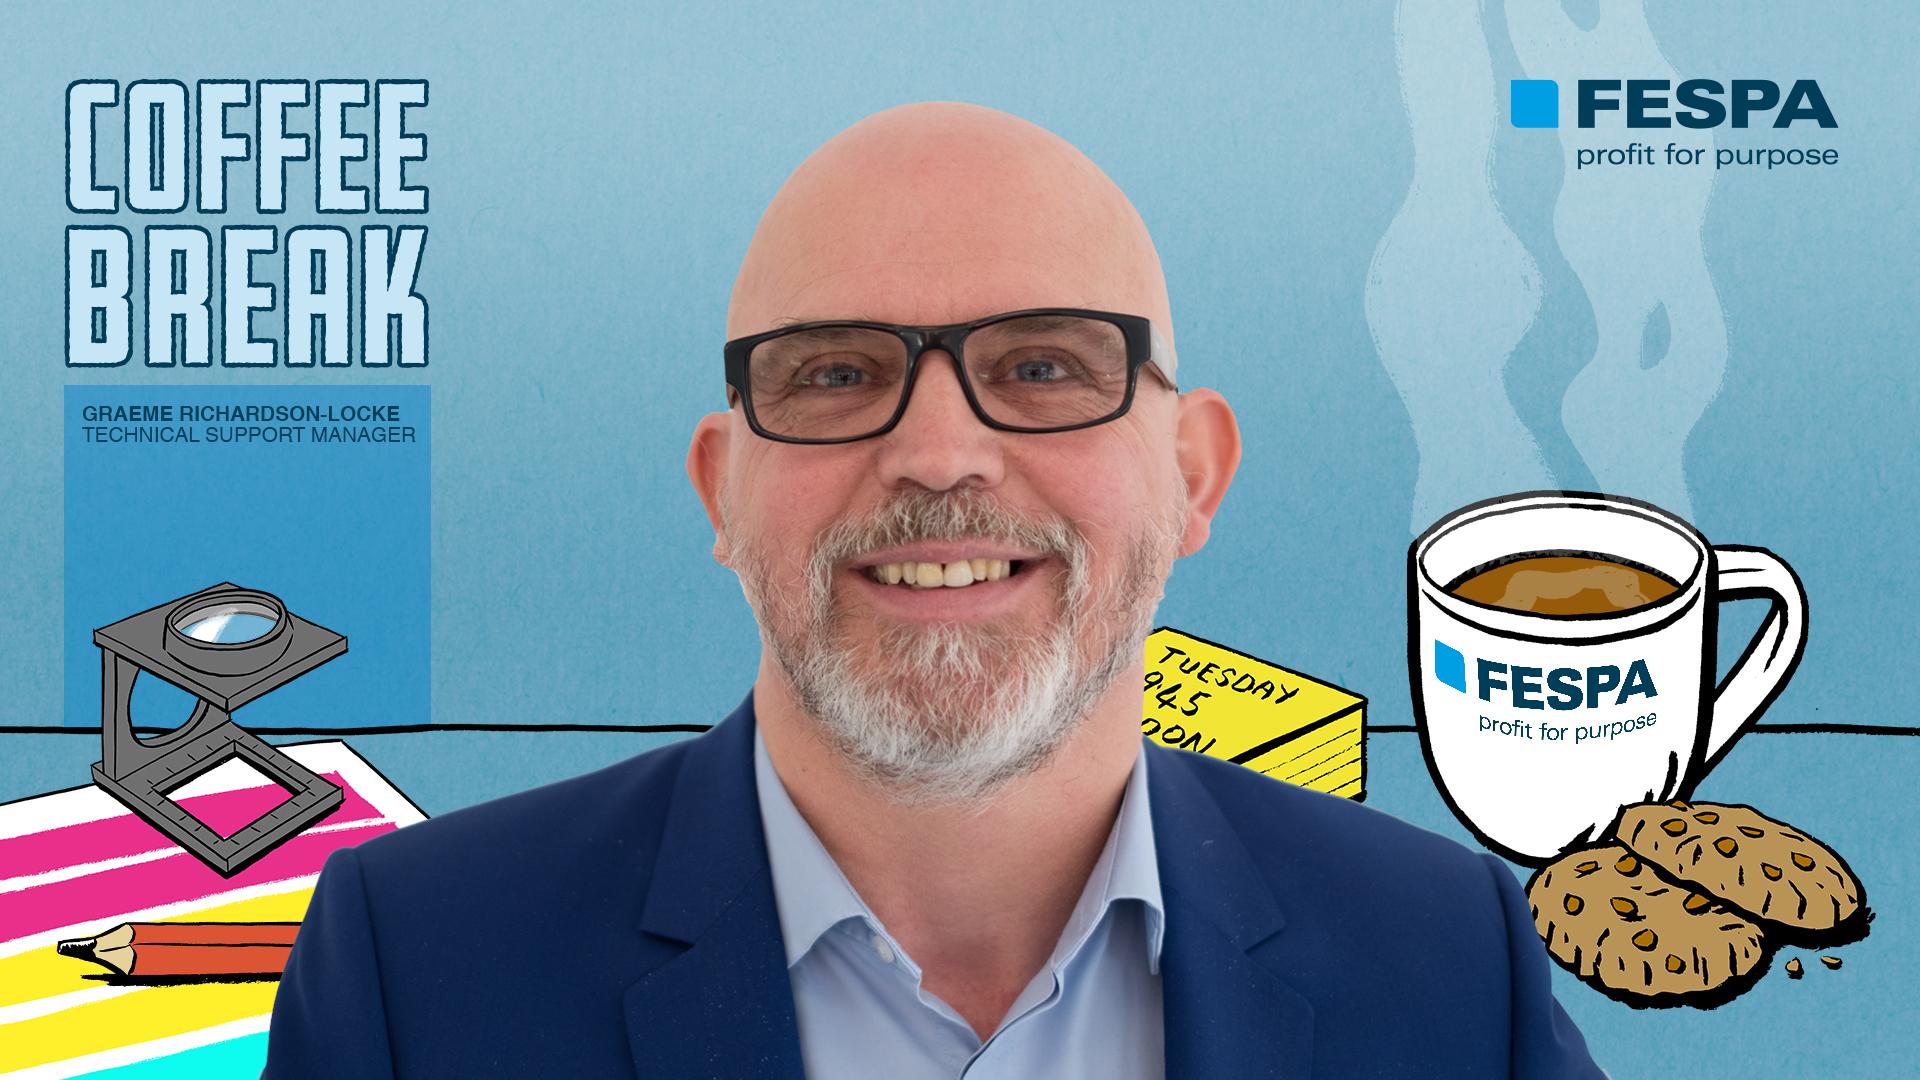 FESPA Coffee Break_Graeme Richardson-Locke, Technical Support Manager, FESPA